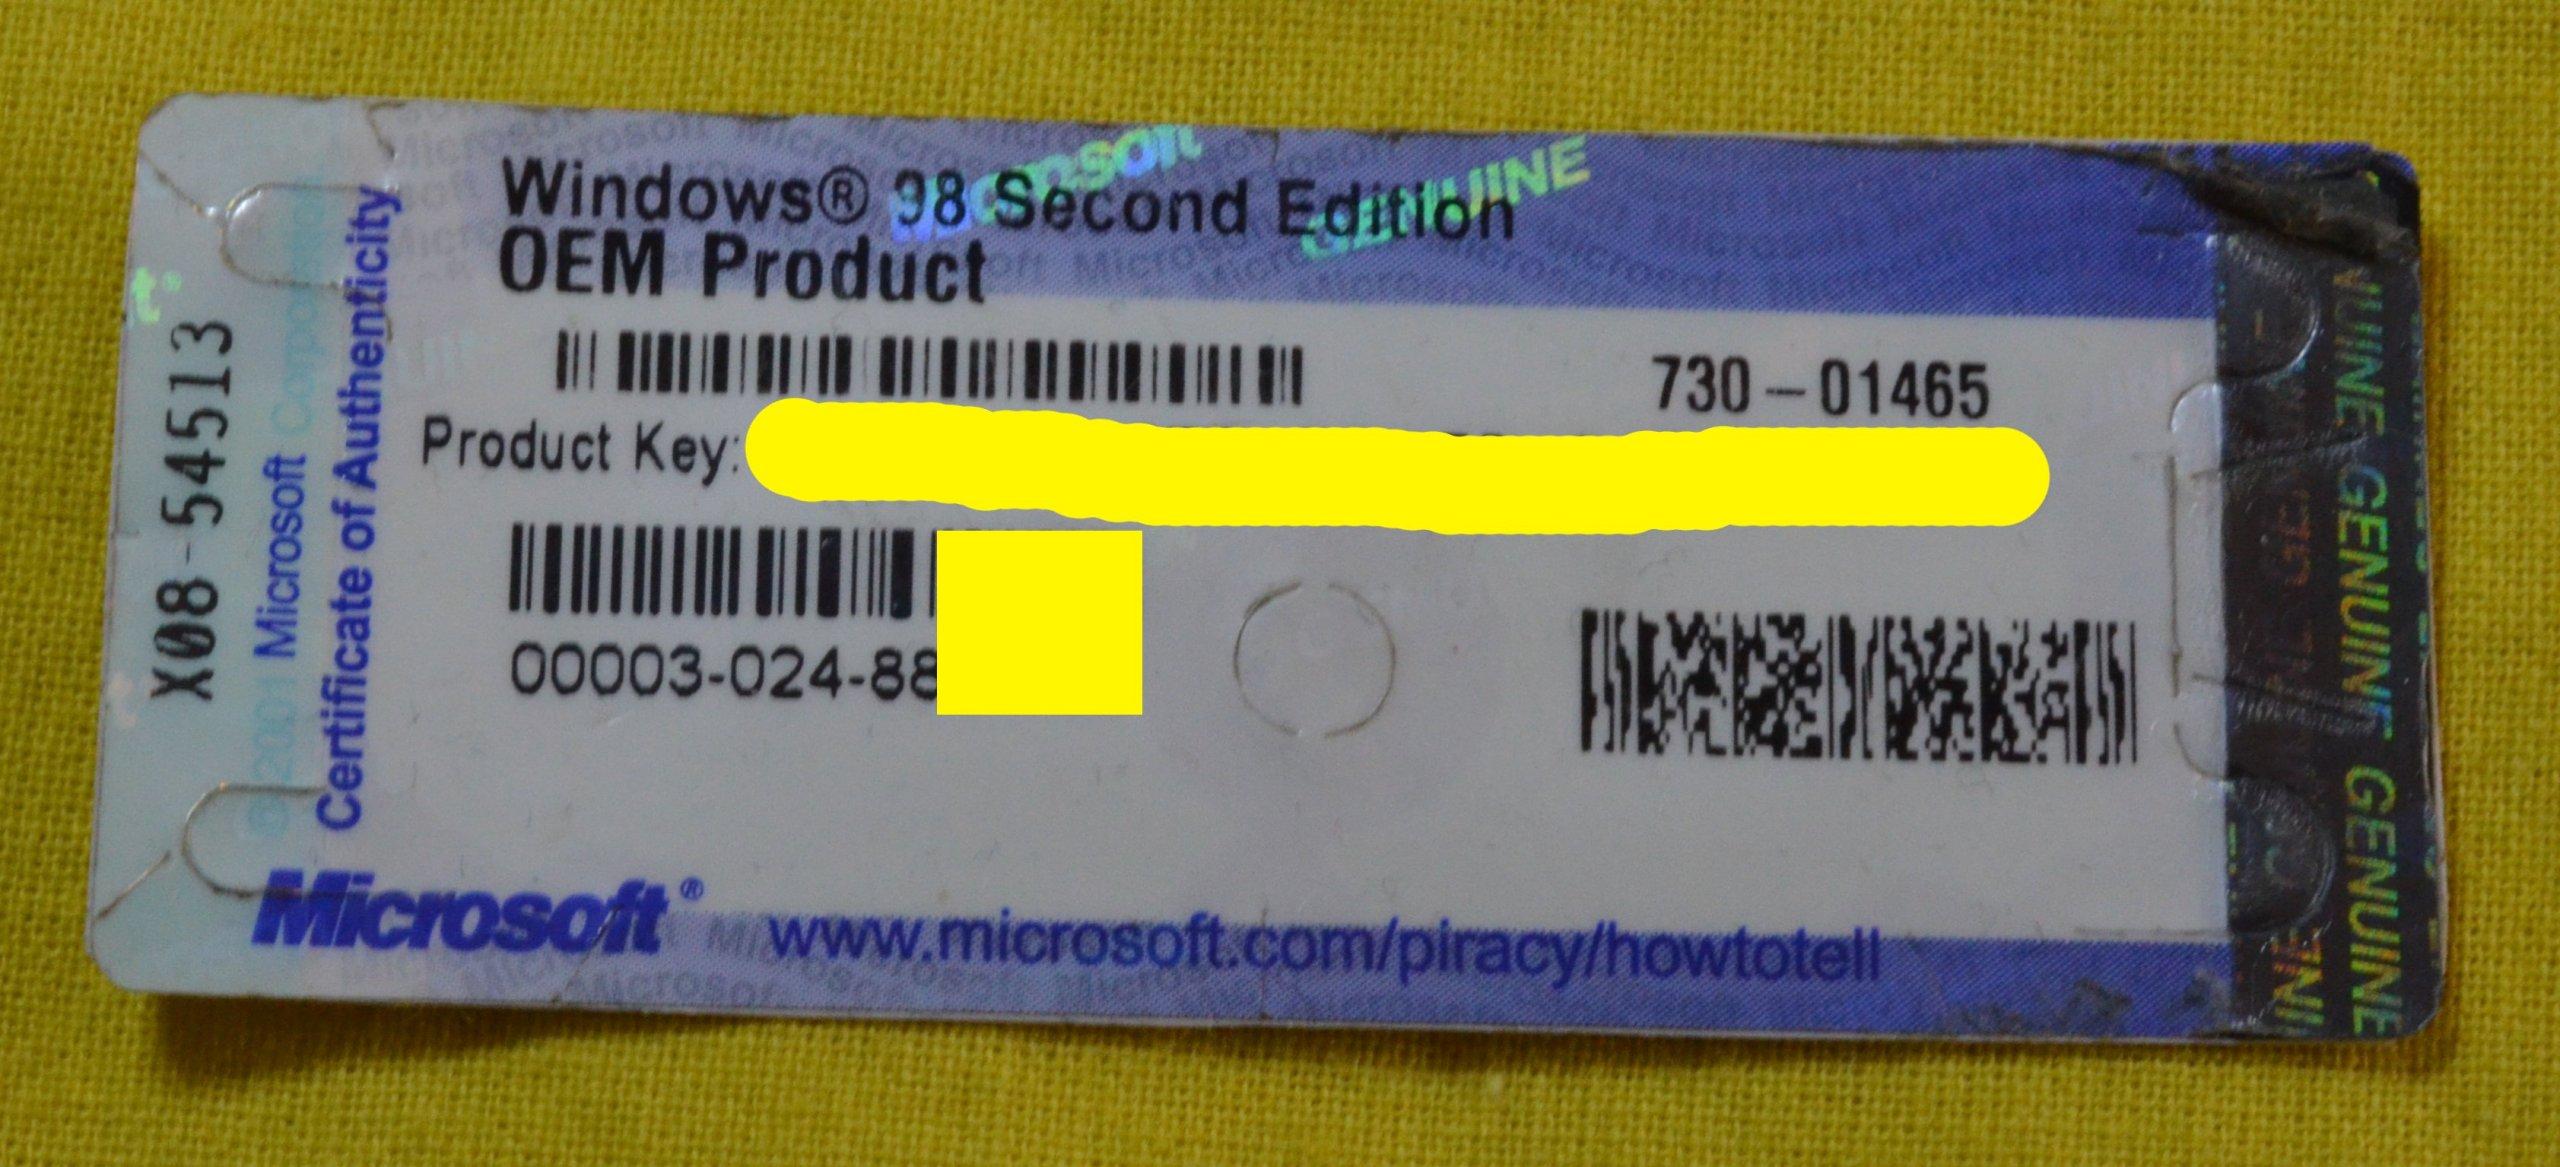 MICROSOFT WINDOWS 98 SECOND EDITION OEM